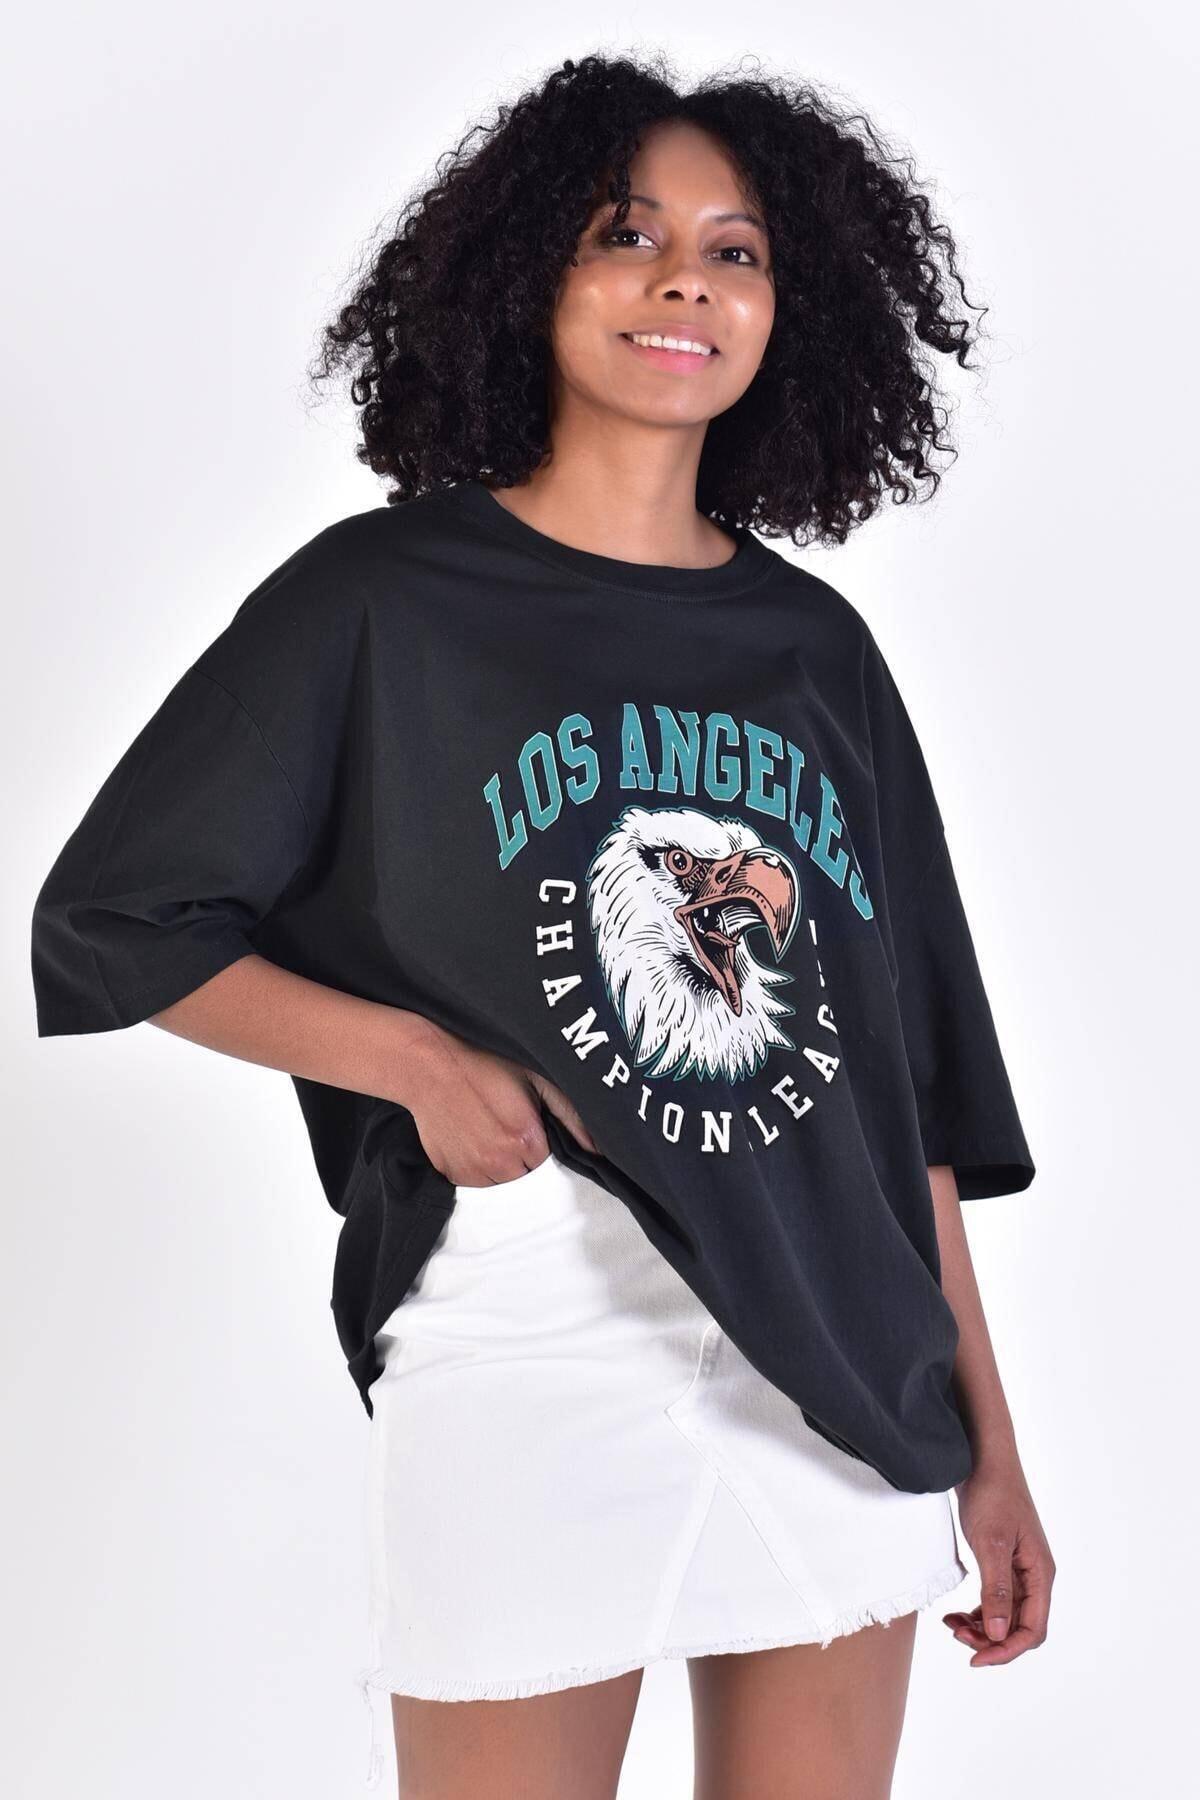 Addax Kadın Füme Baskılı T-Shirt P9420 - C5 Adx-0000022126 1